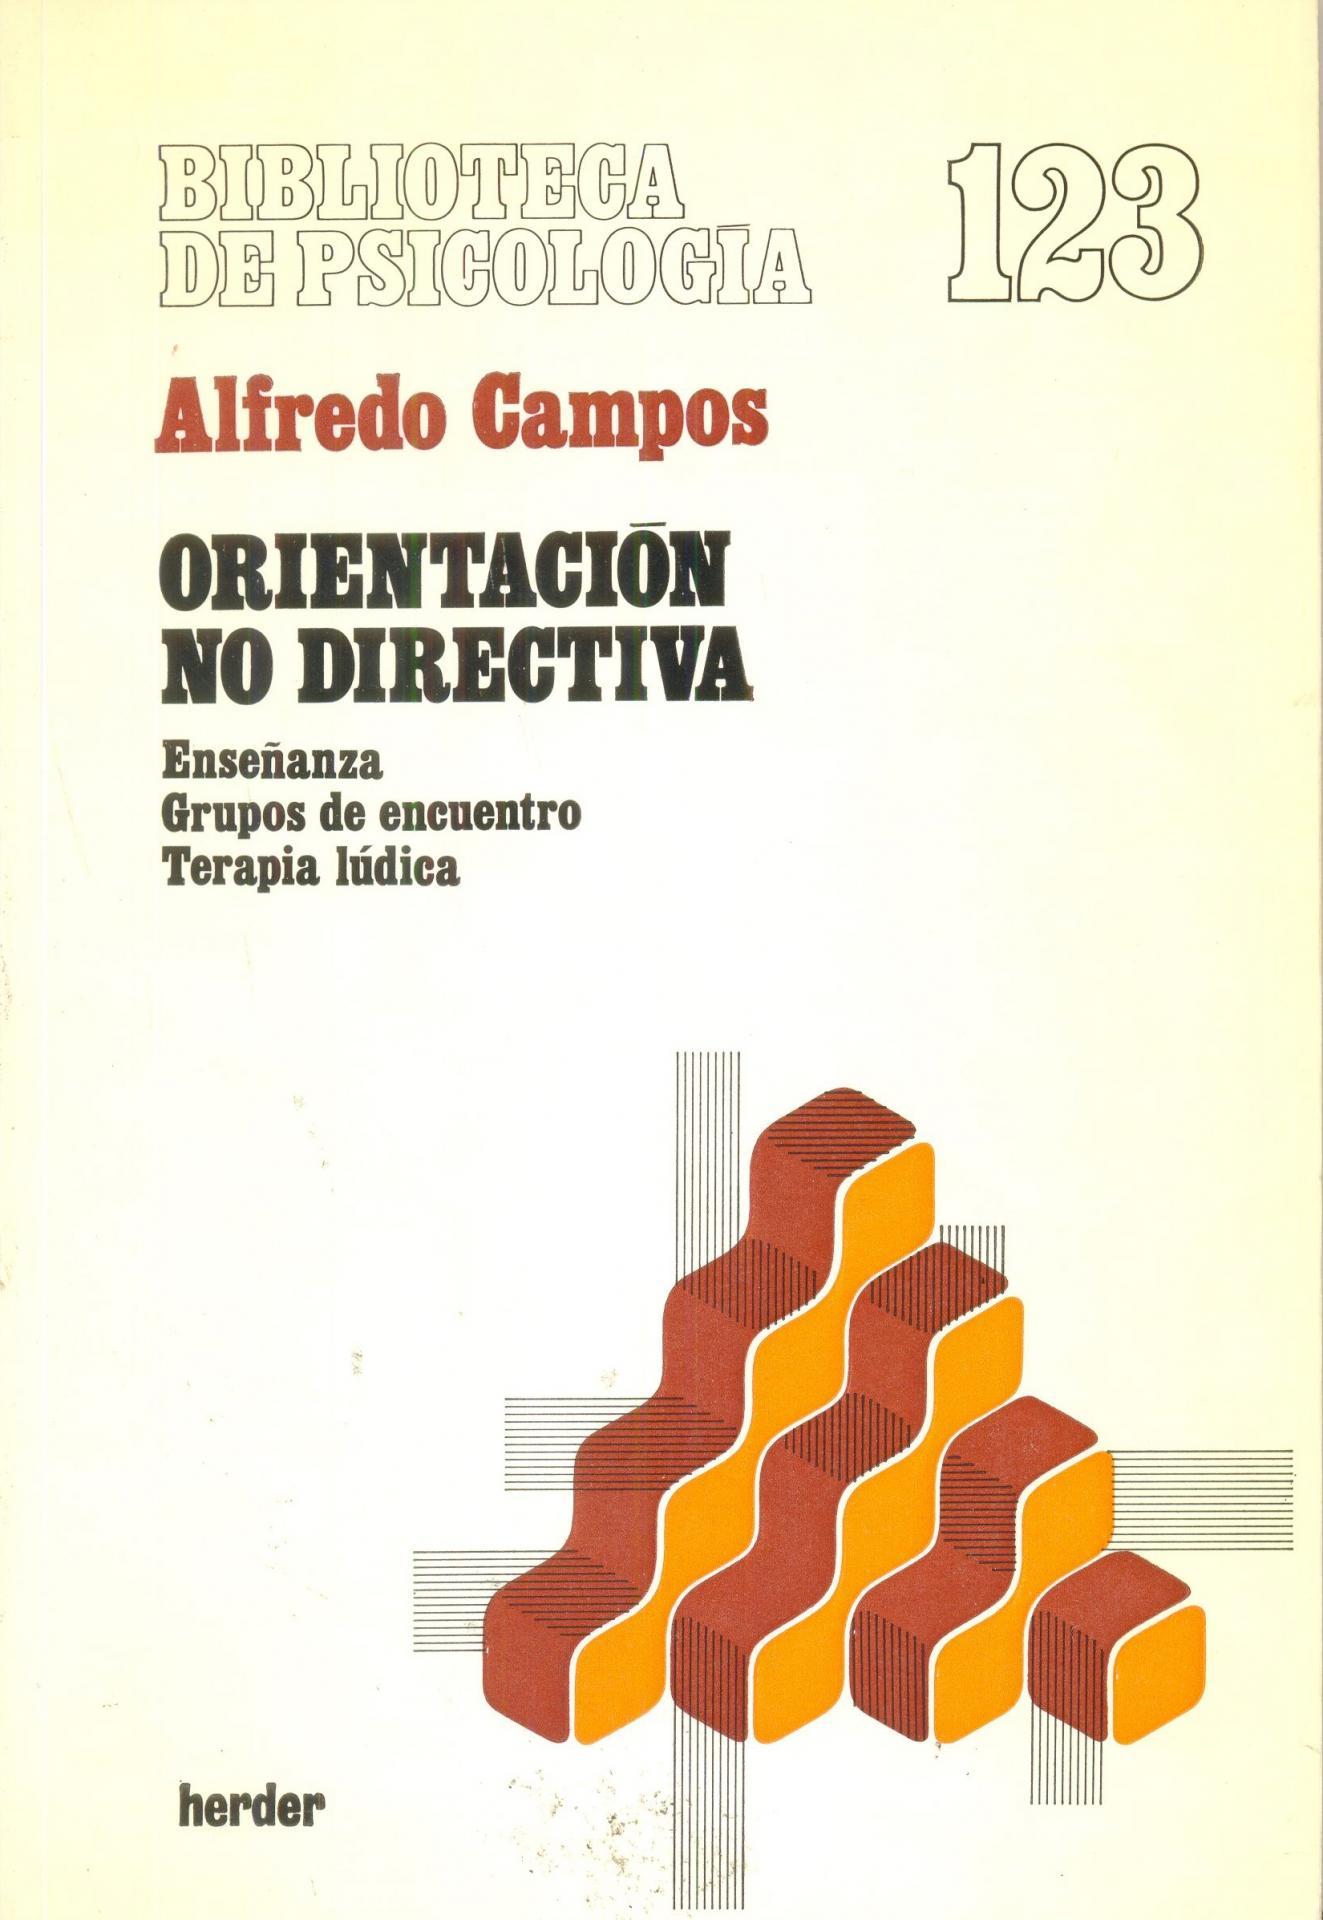 ORIENTACIÓN NO DIRECTIVA. Campos, A.